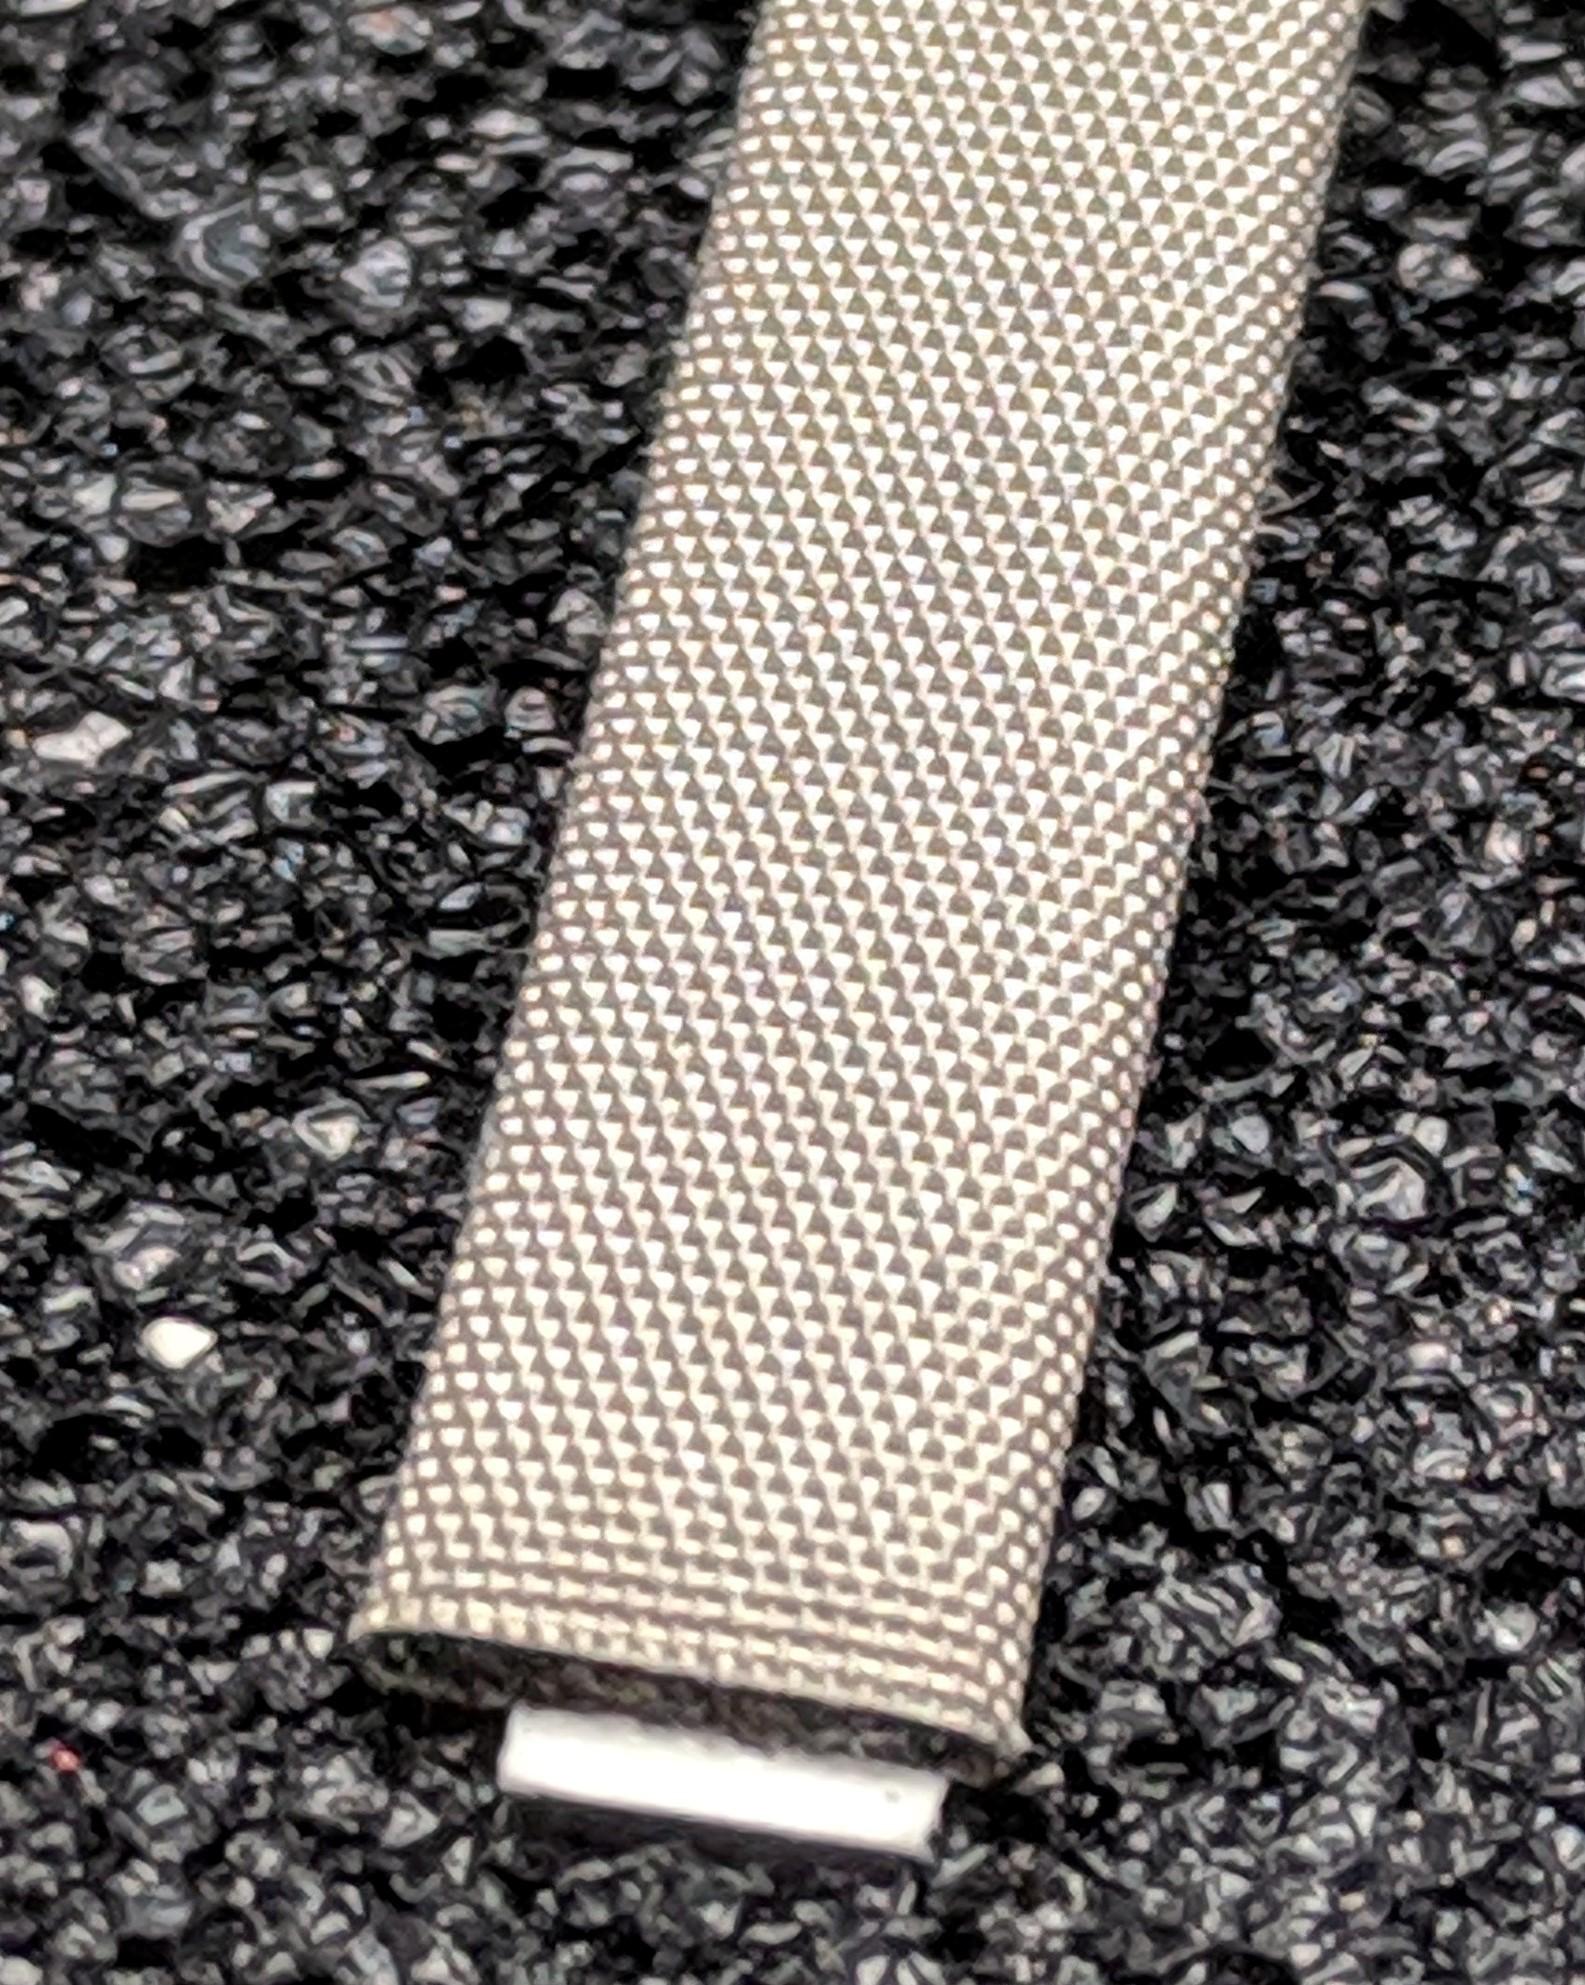 420-0050-0015SFG Fabric Over Foam Soft EMI Shielding Gasket Flat Shape 5.0mm x 1.5mm (WxH)